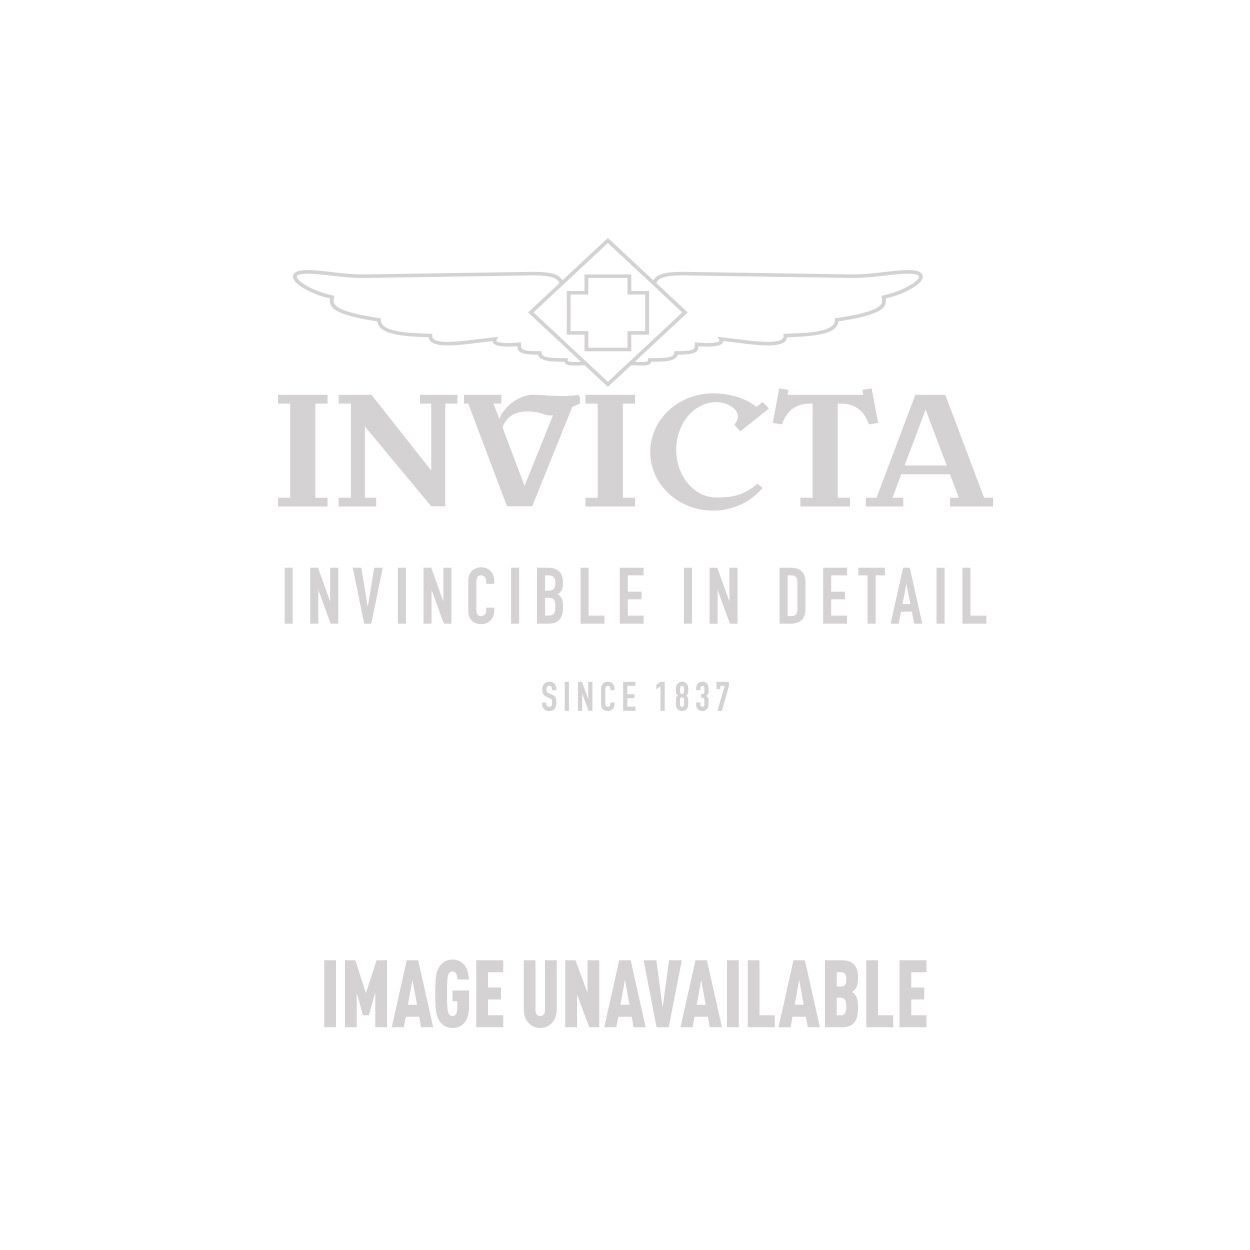 Invicta Corduba Swiss Movement Quartz Watch - Gunmetal case with Grey tone Leather band - Model 90207